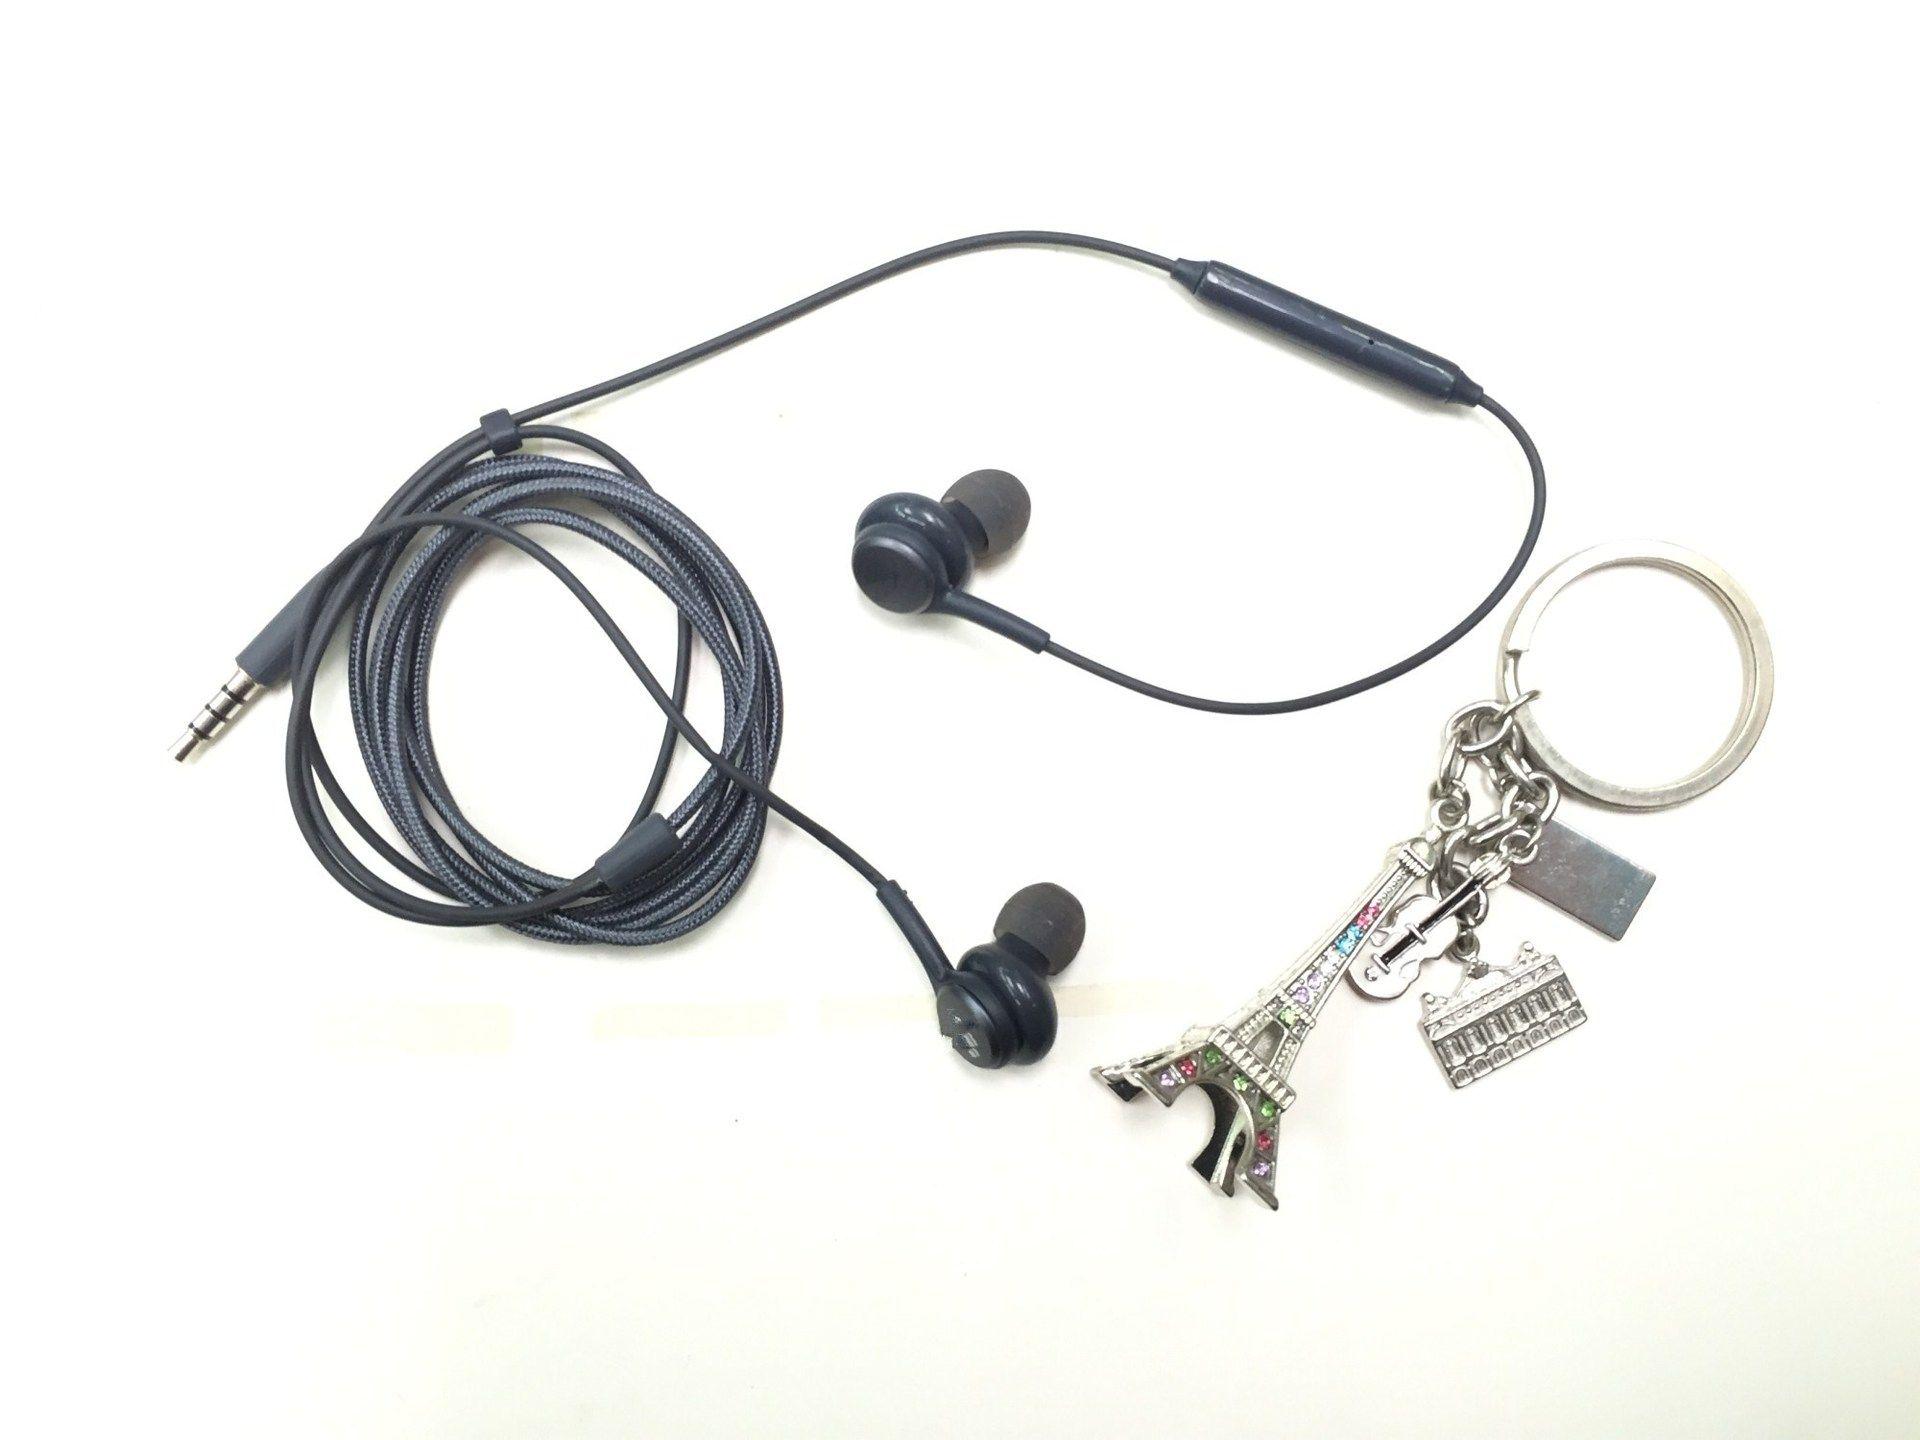 3 5mm In Ear Earphone For Samsung S8 Plus Headphones Eo